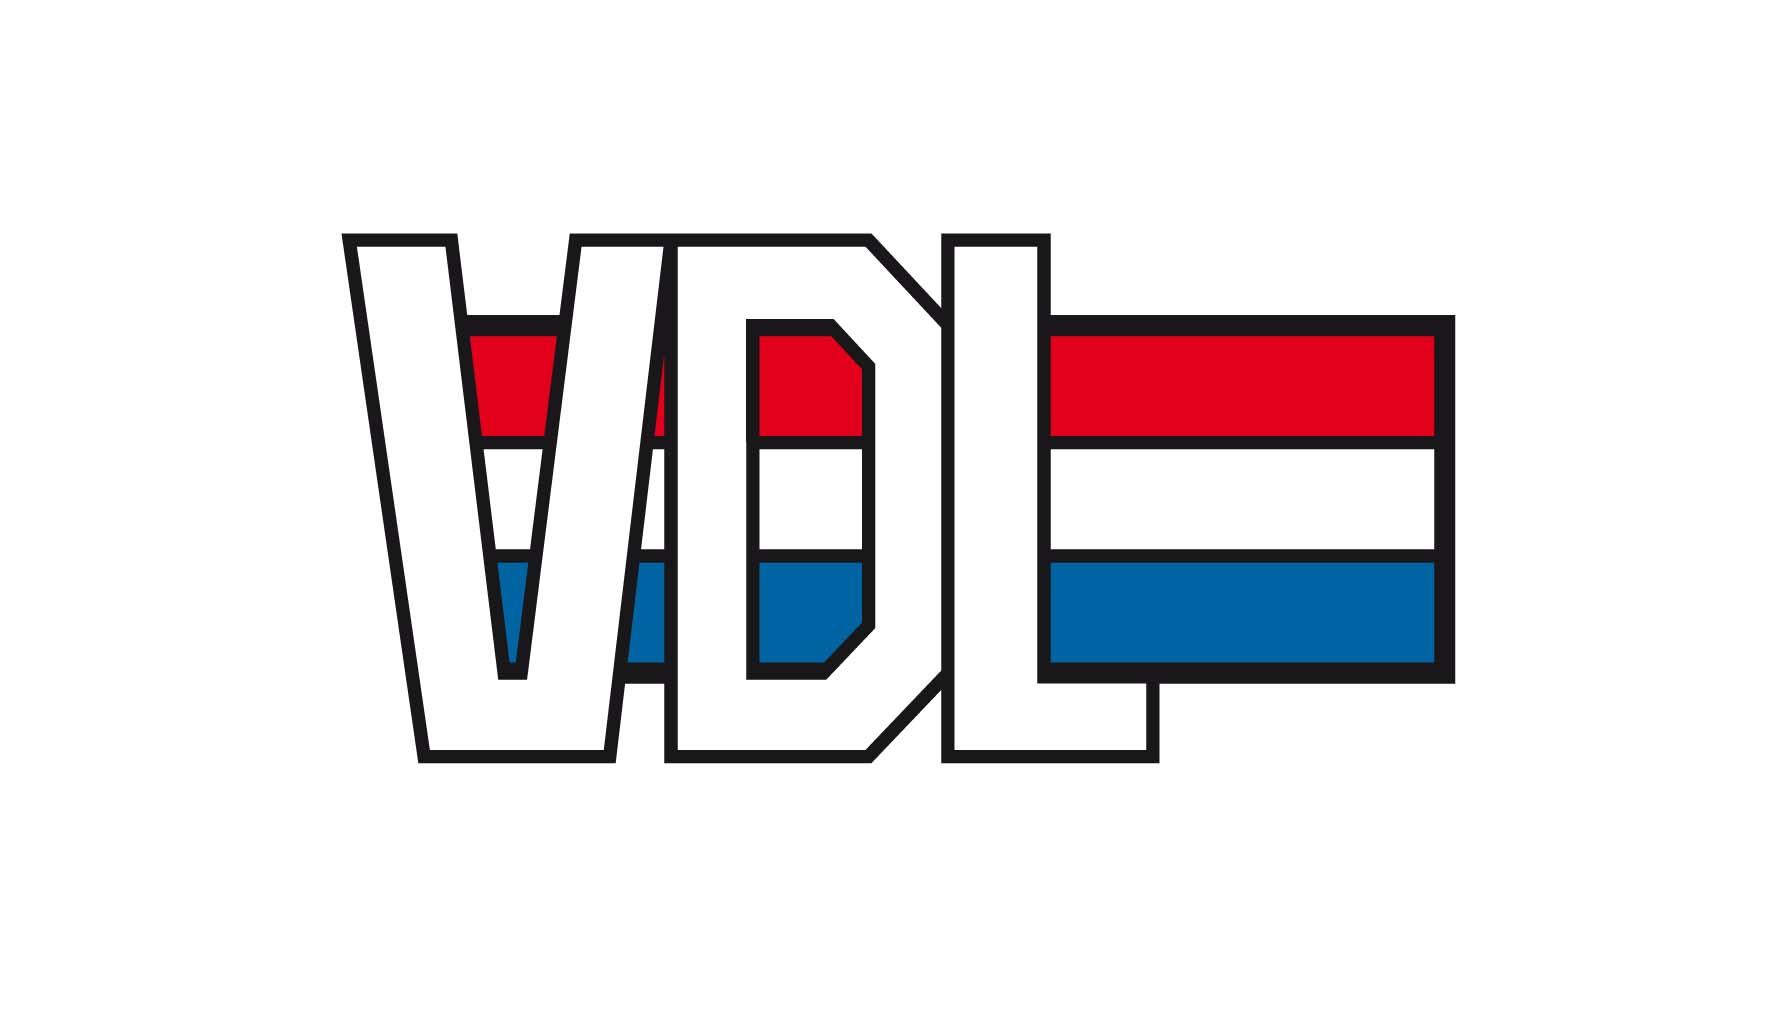 LOGO VDL NL rgb ow_photo.jpg